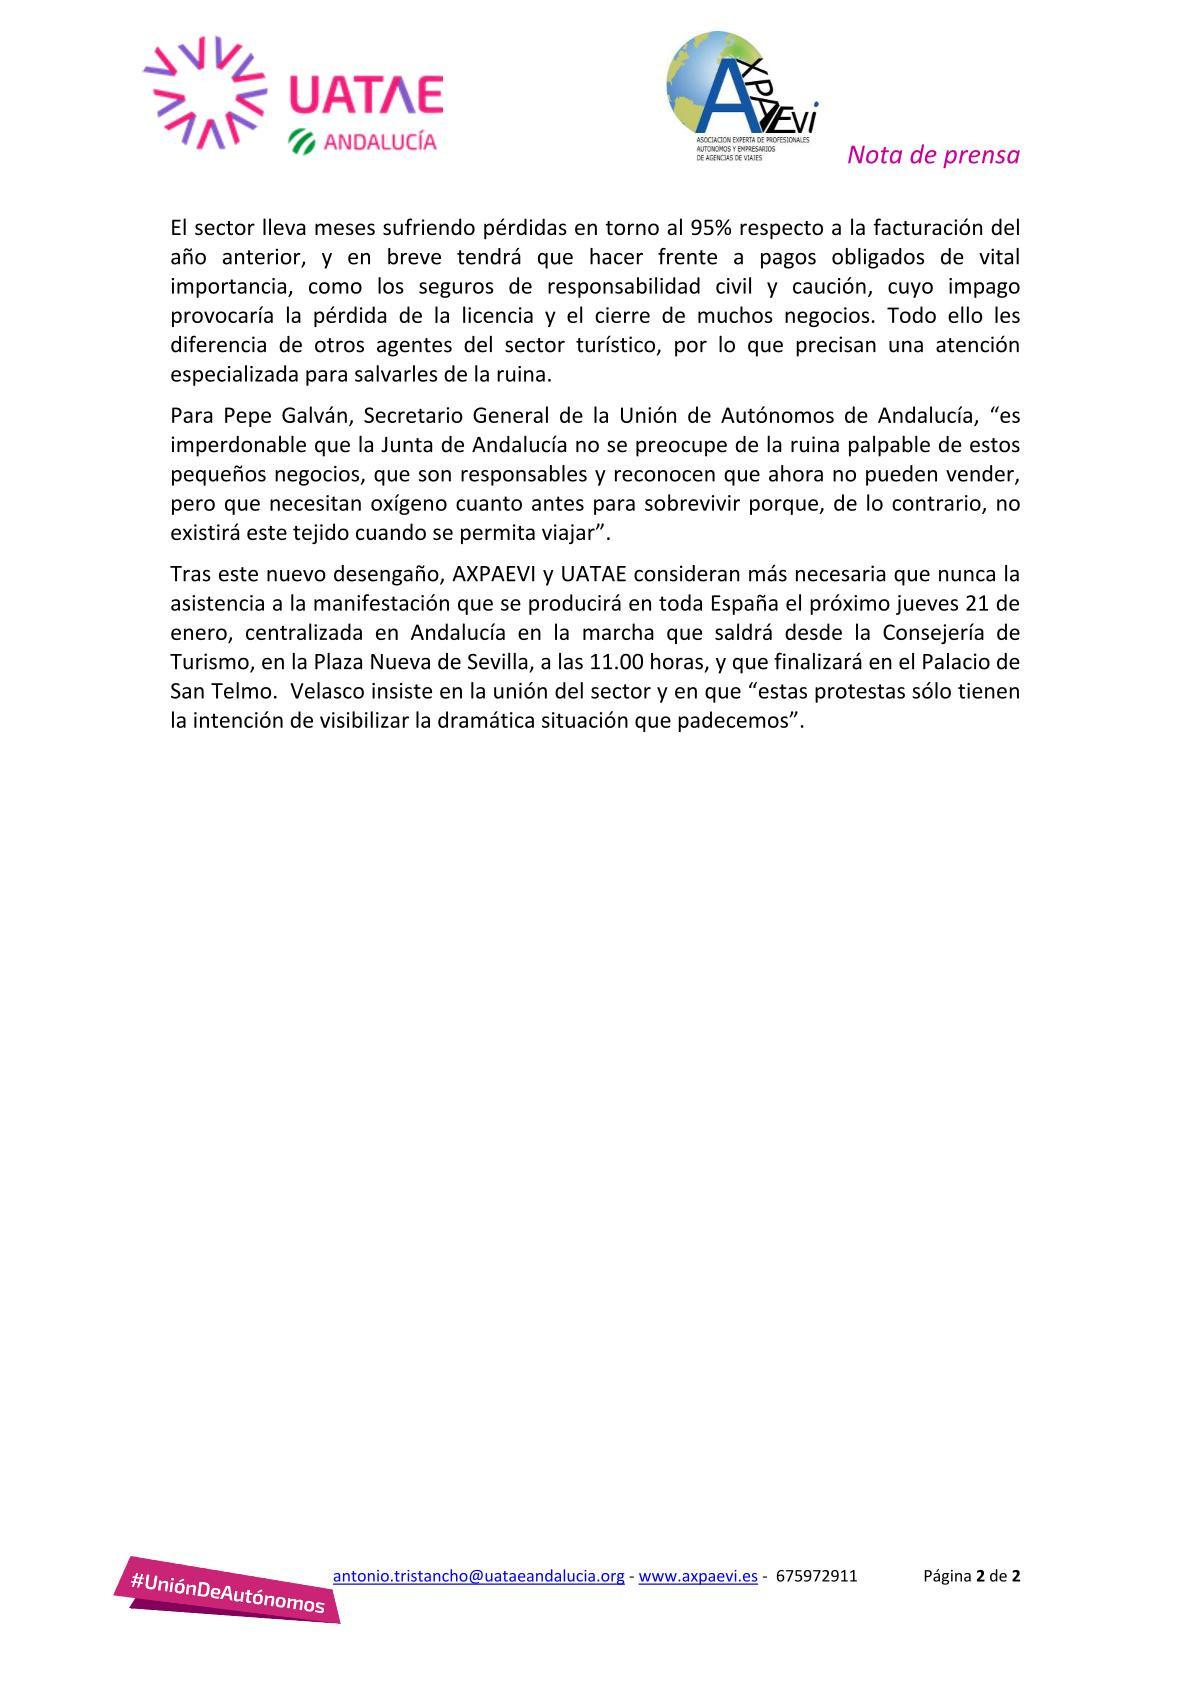 Imagen nota de prensa Hosteltur